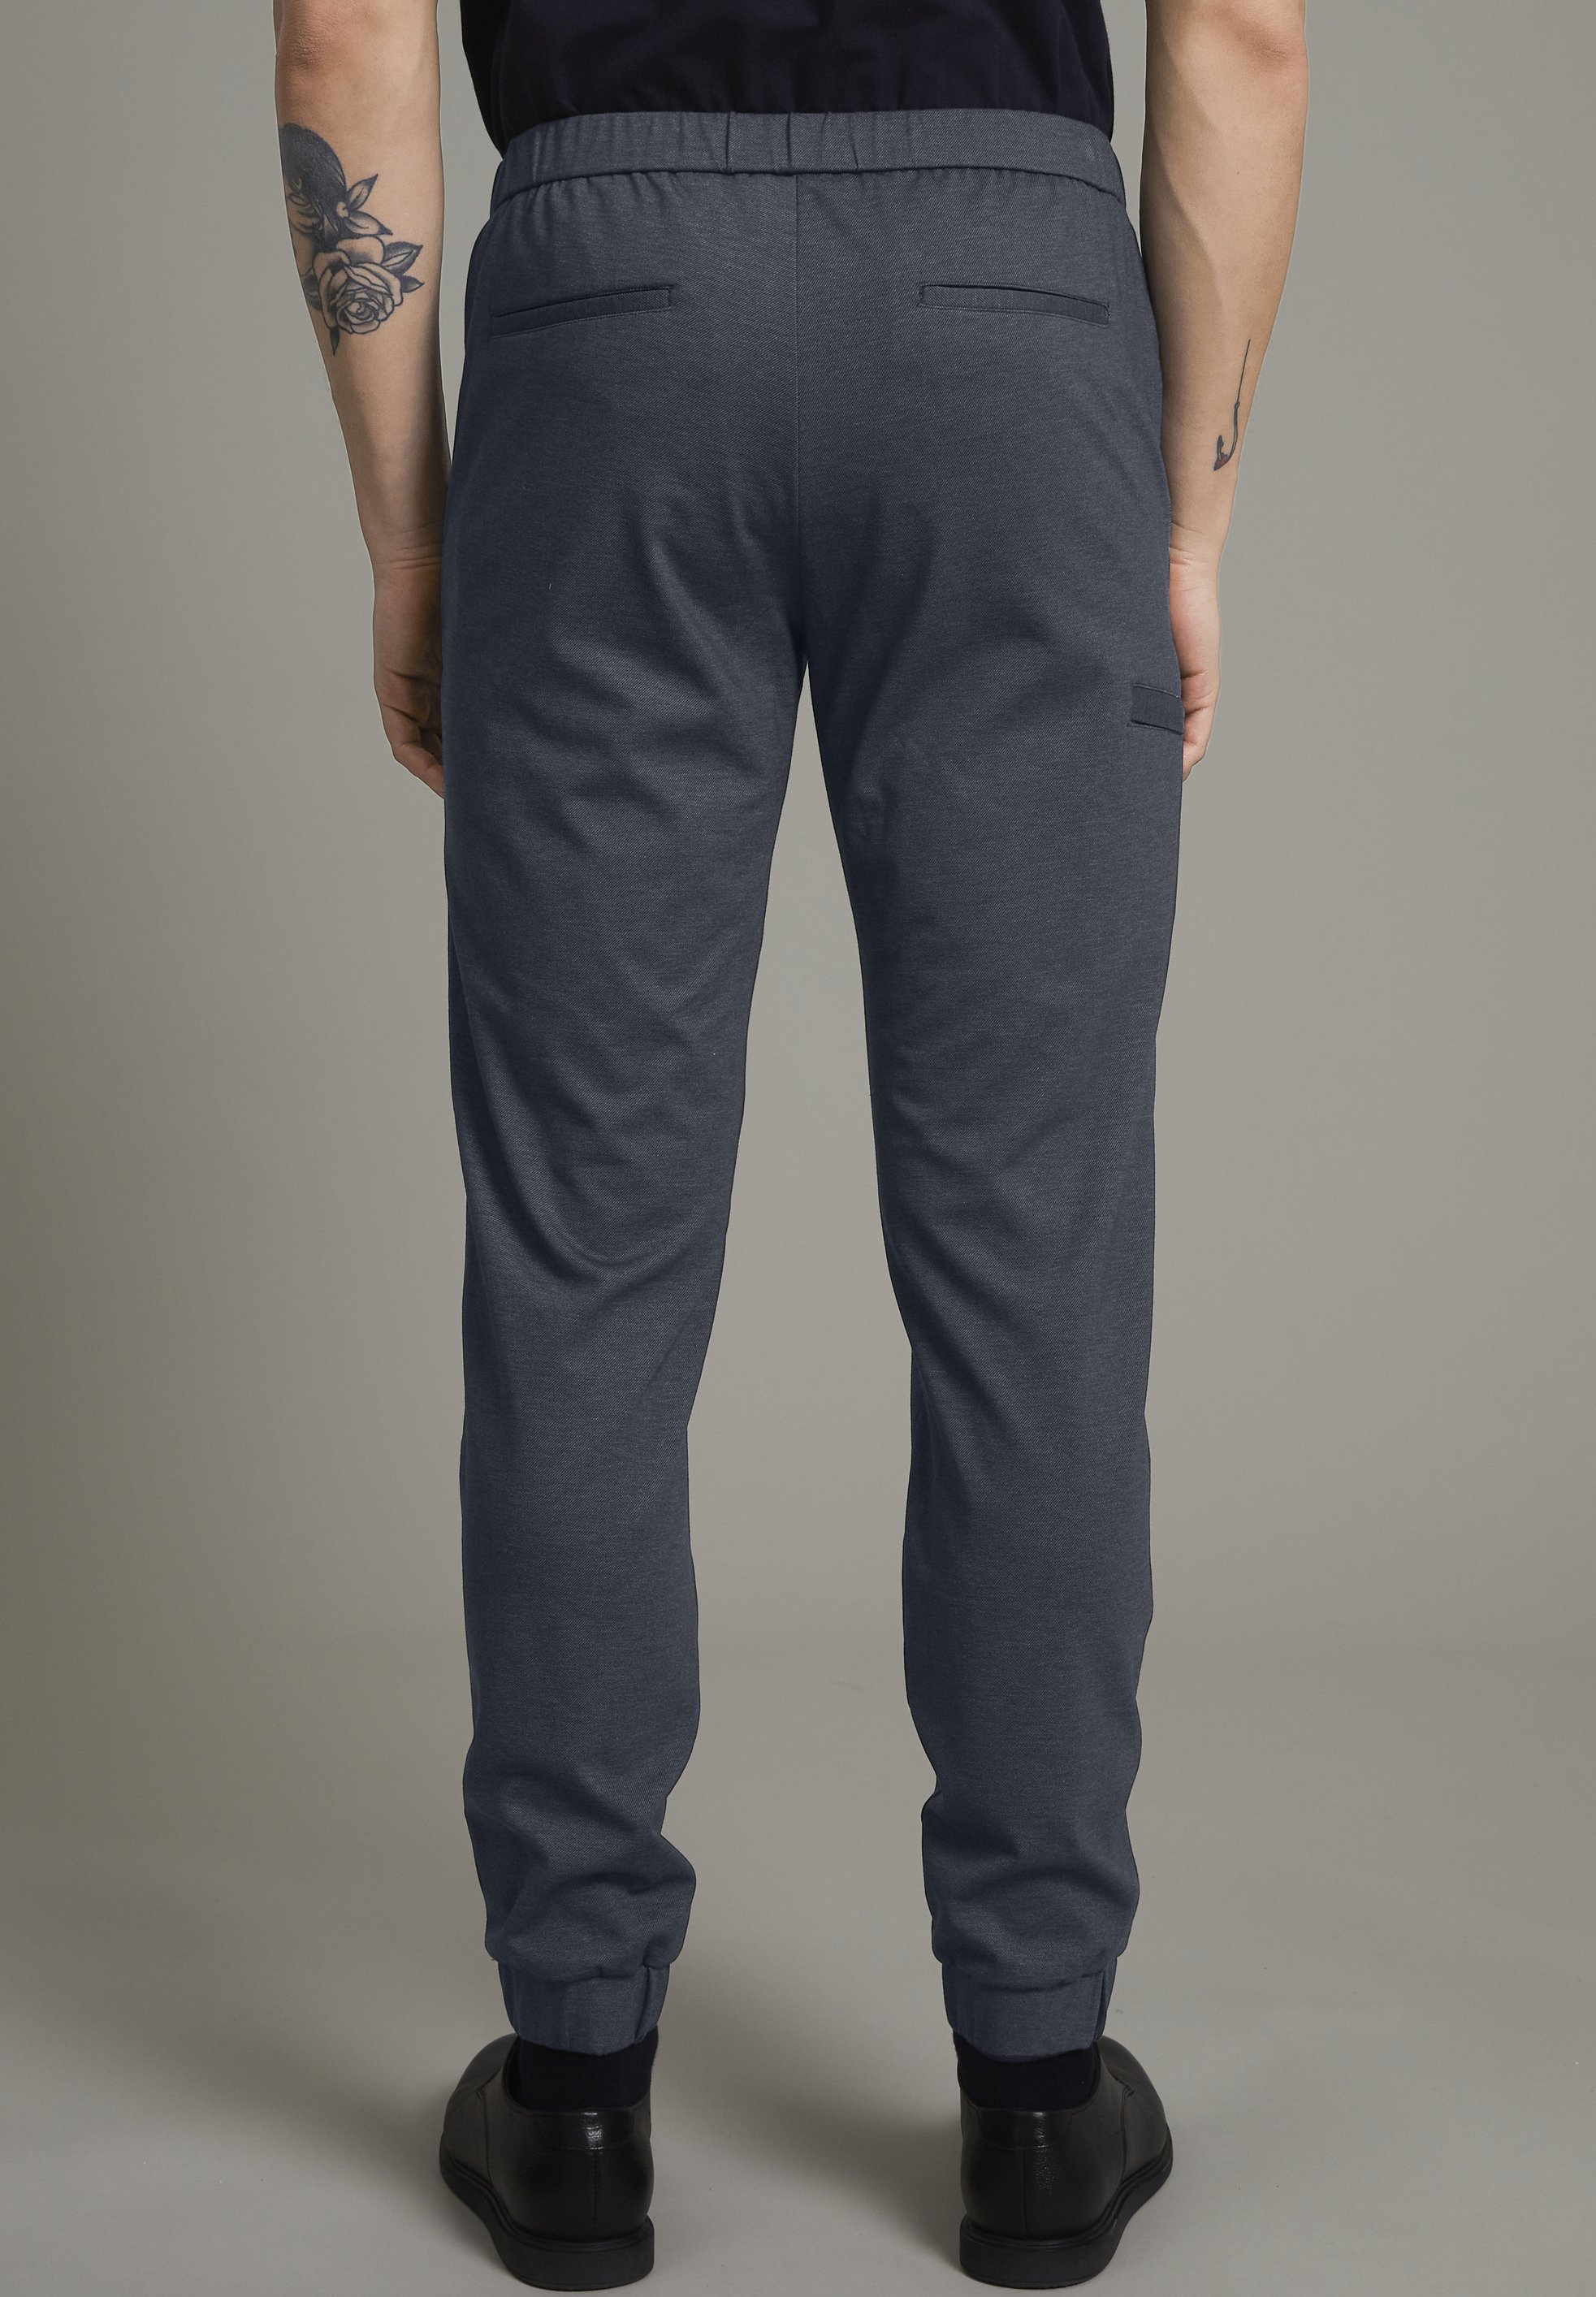 Homme MALANCET - Pantalon cargo